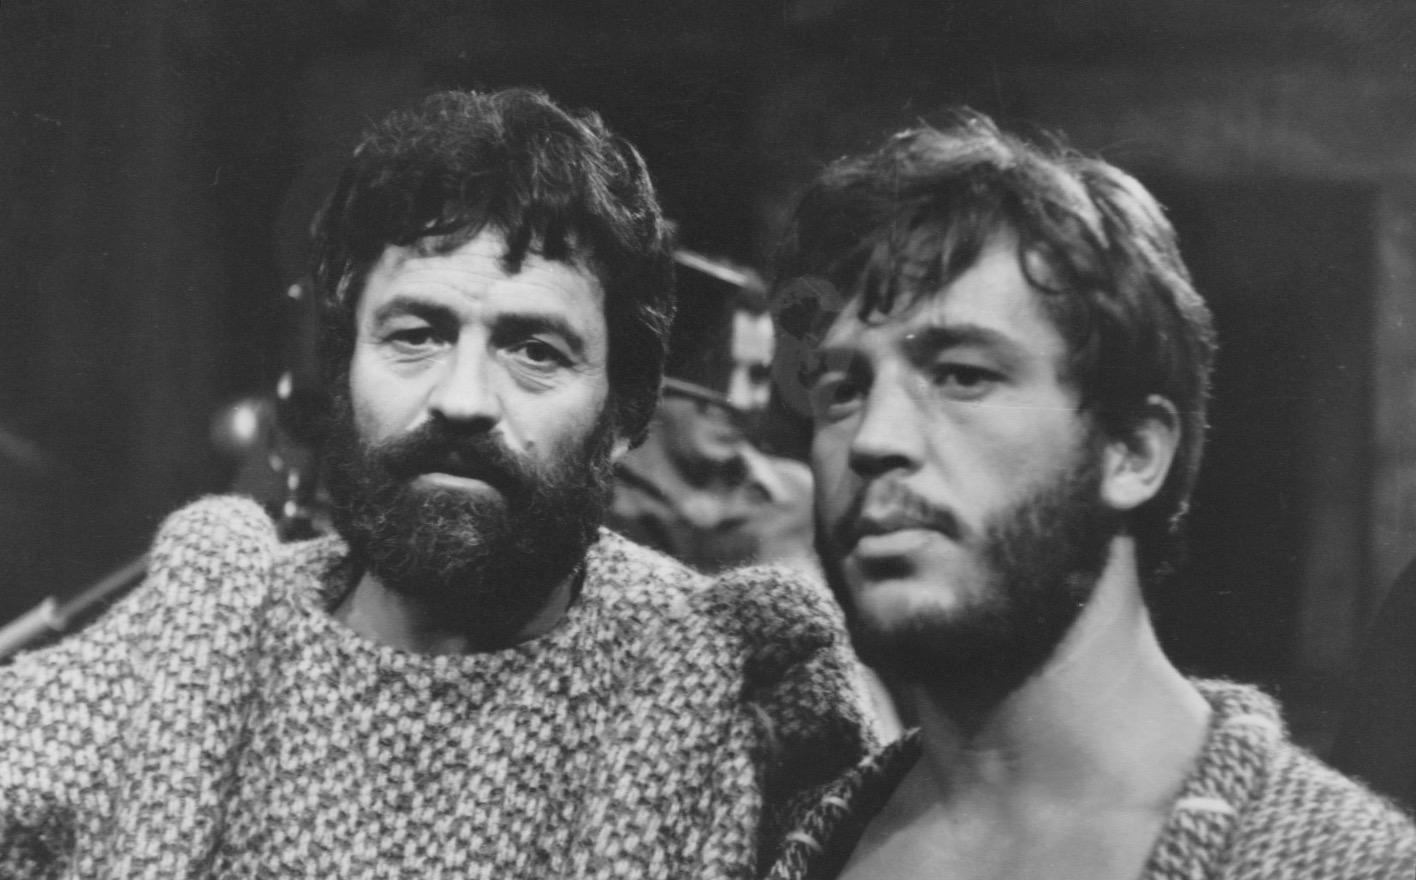 Igor Sunara and Ilija Ivezic in Odissea (1968)